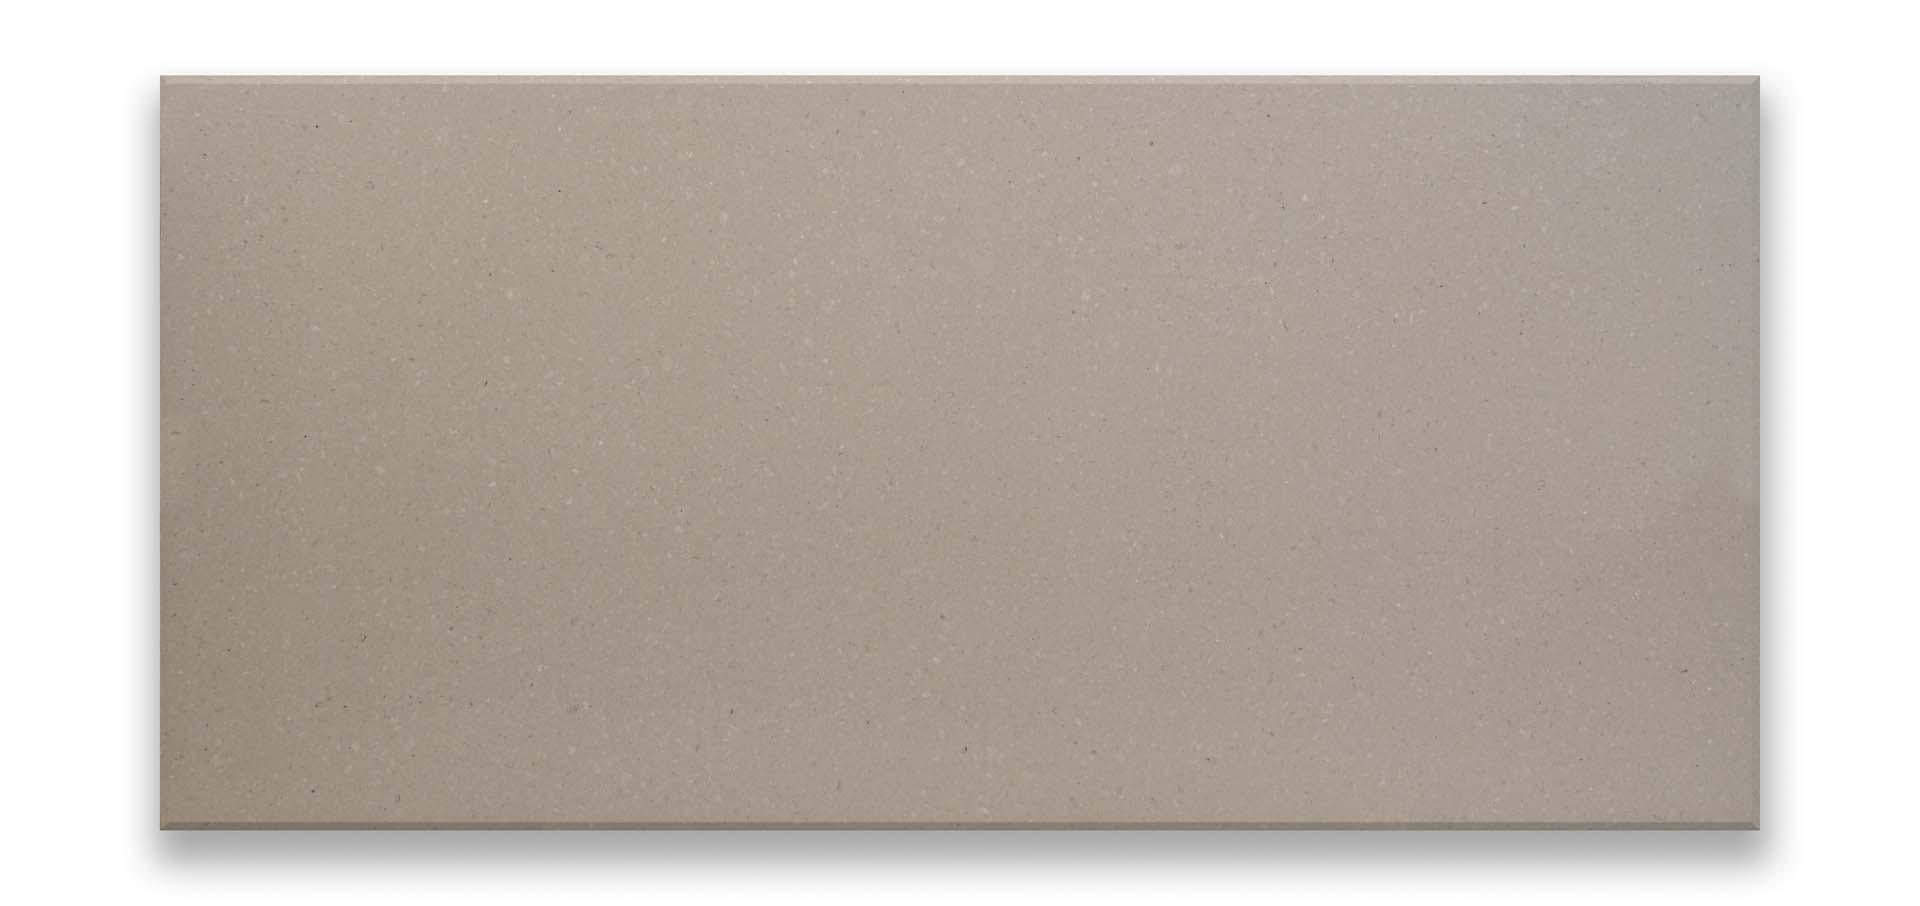 Caesarstone Clamshell CE200707 38358 104740aa